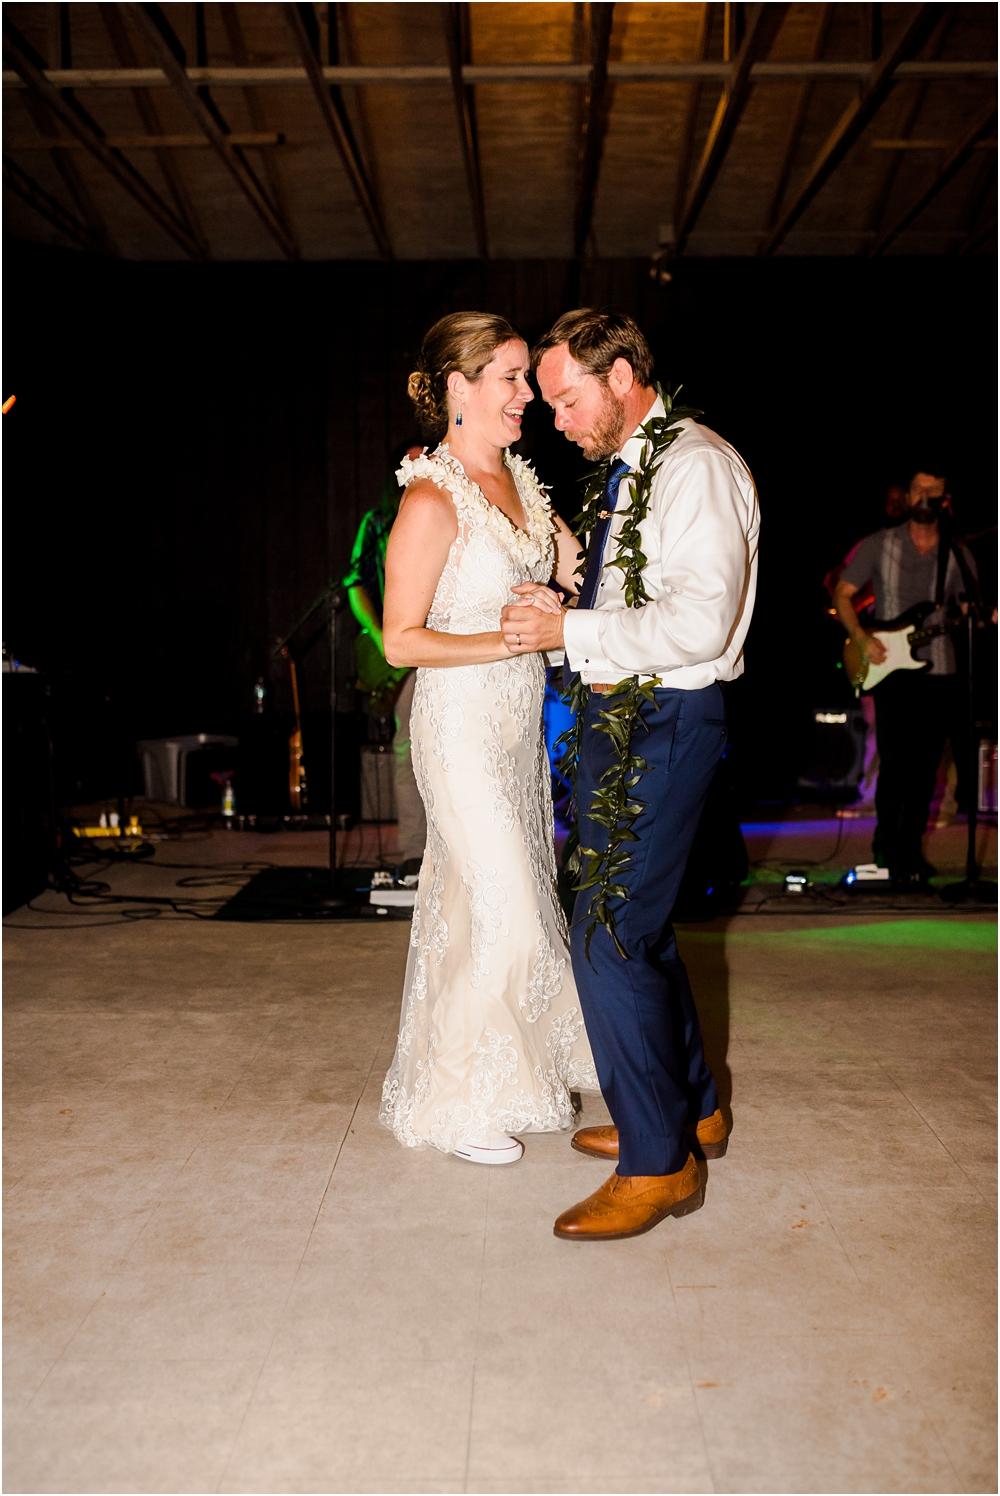 ledman-wedding-kiersten-stevenson-photography-30a-panama-city-beach-dothan-tallahassee-(755-of-763).JPG